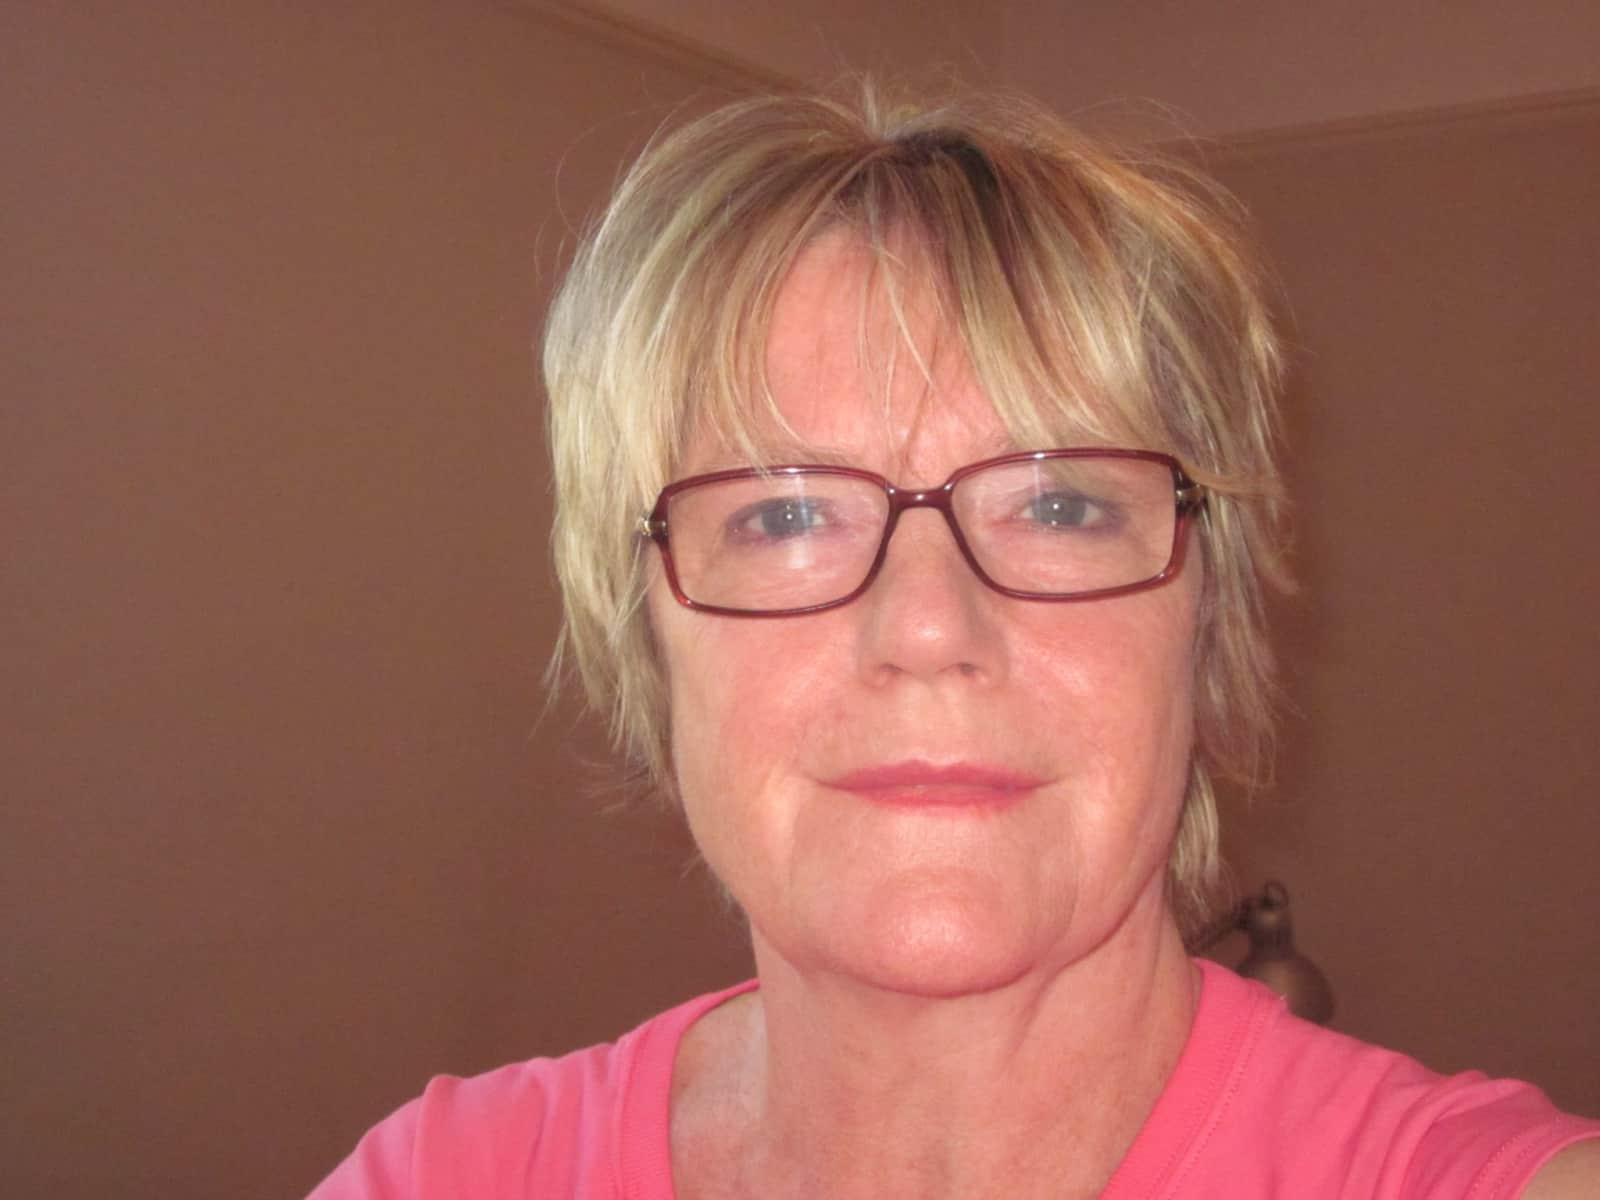 Bridget from London, United Kingdom